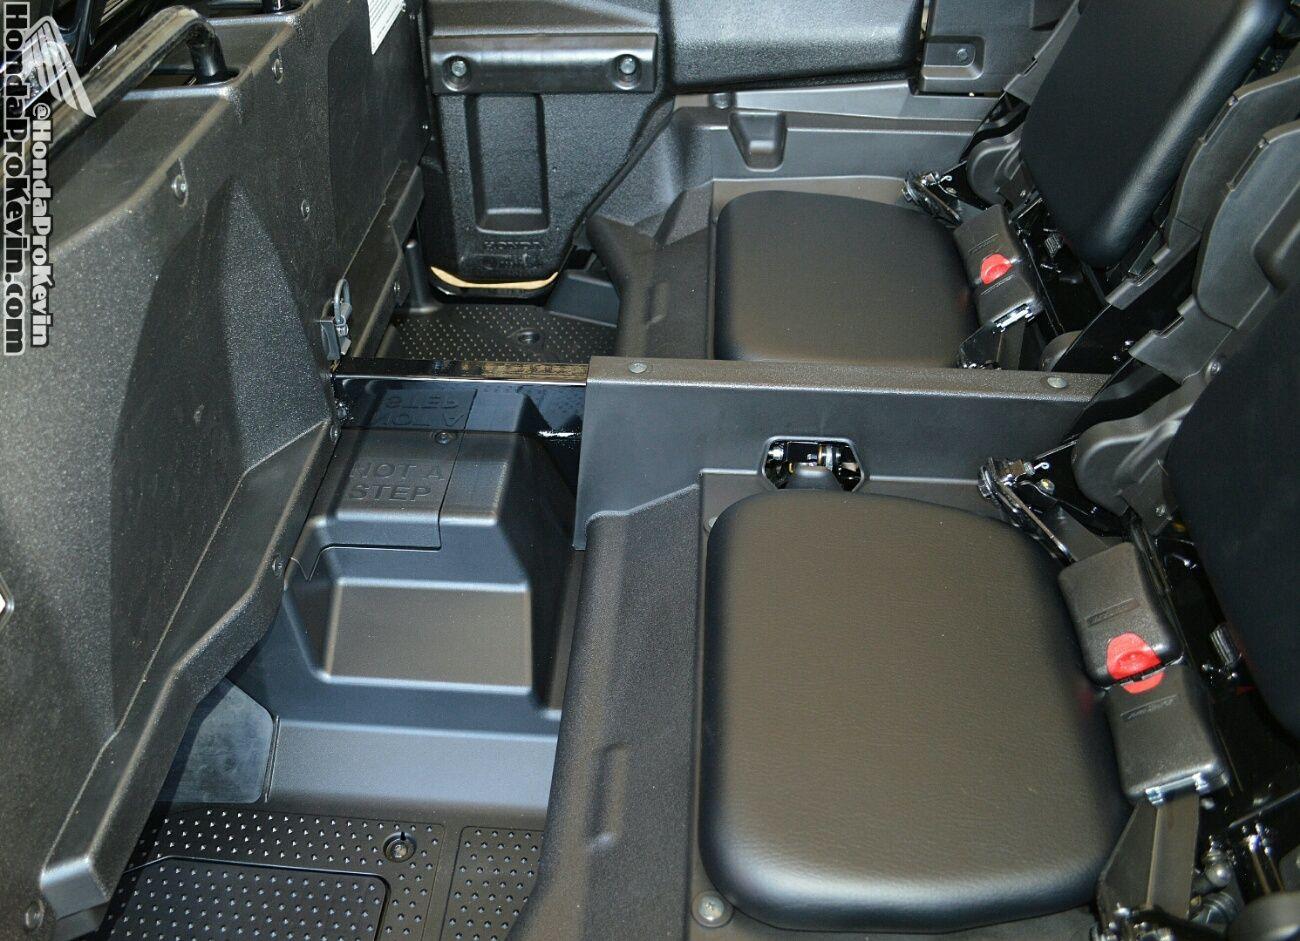 2016 Pioneer 1000 5 Interior Ride Review All New Honda Sxs Utv Side By Atv Pro Kevin